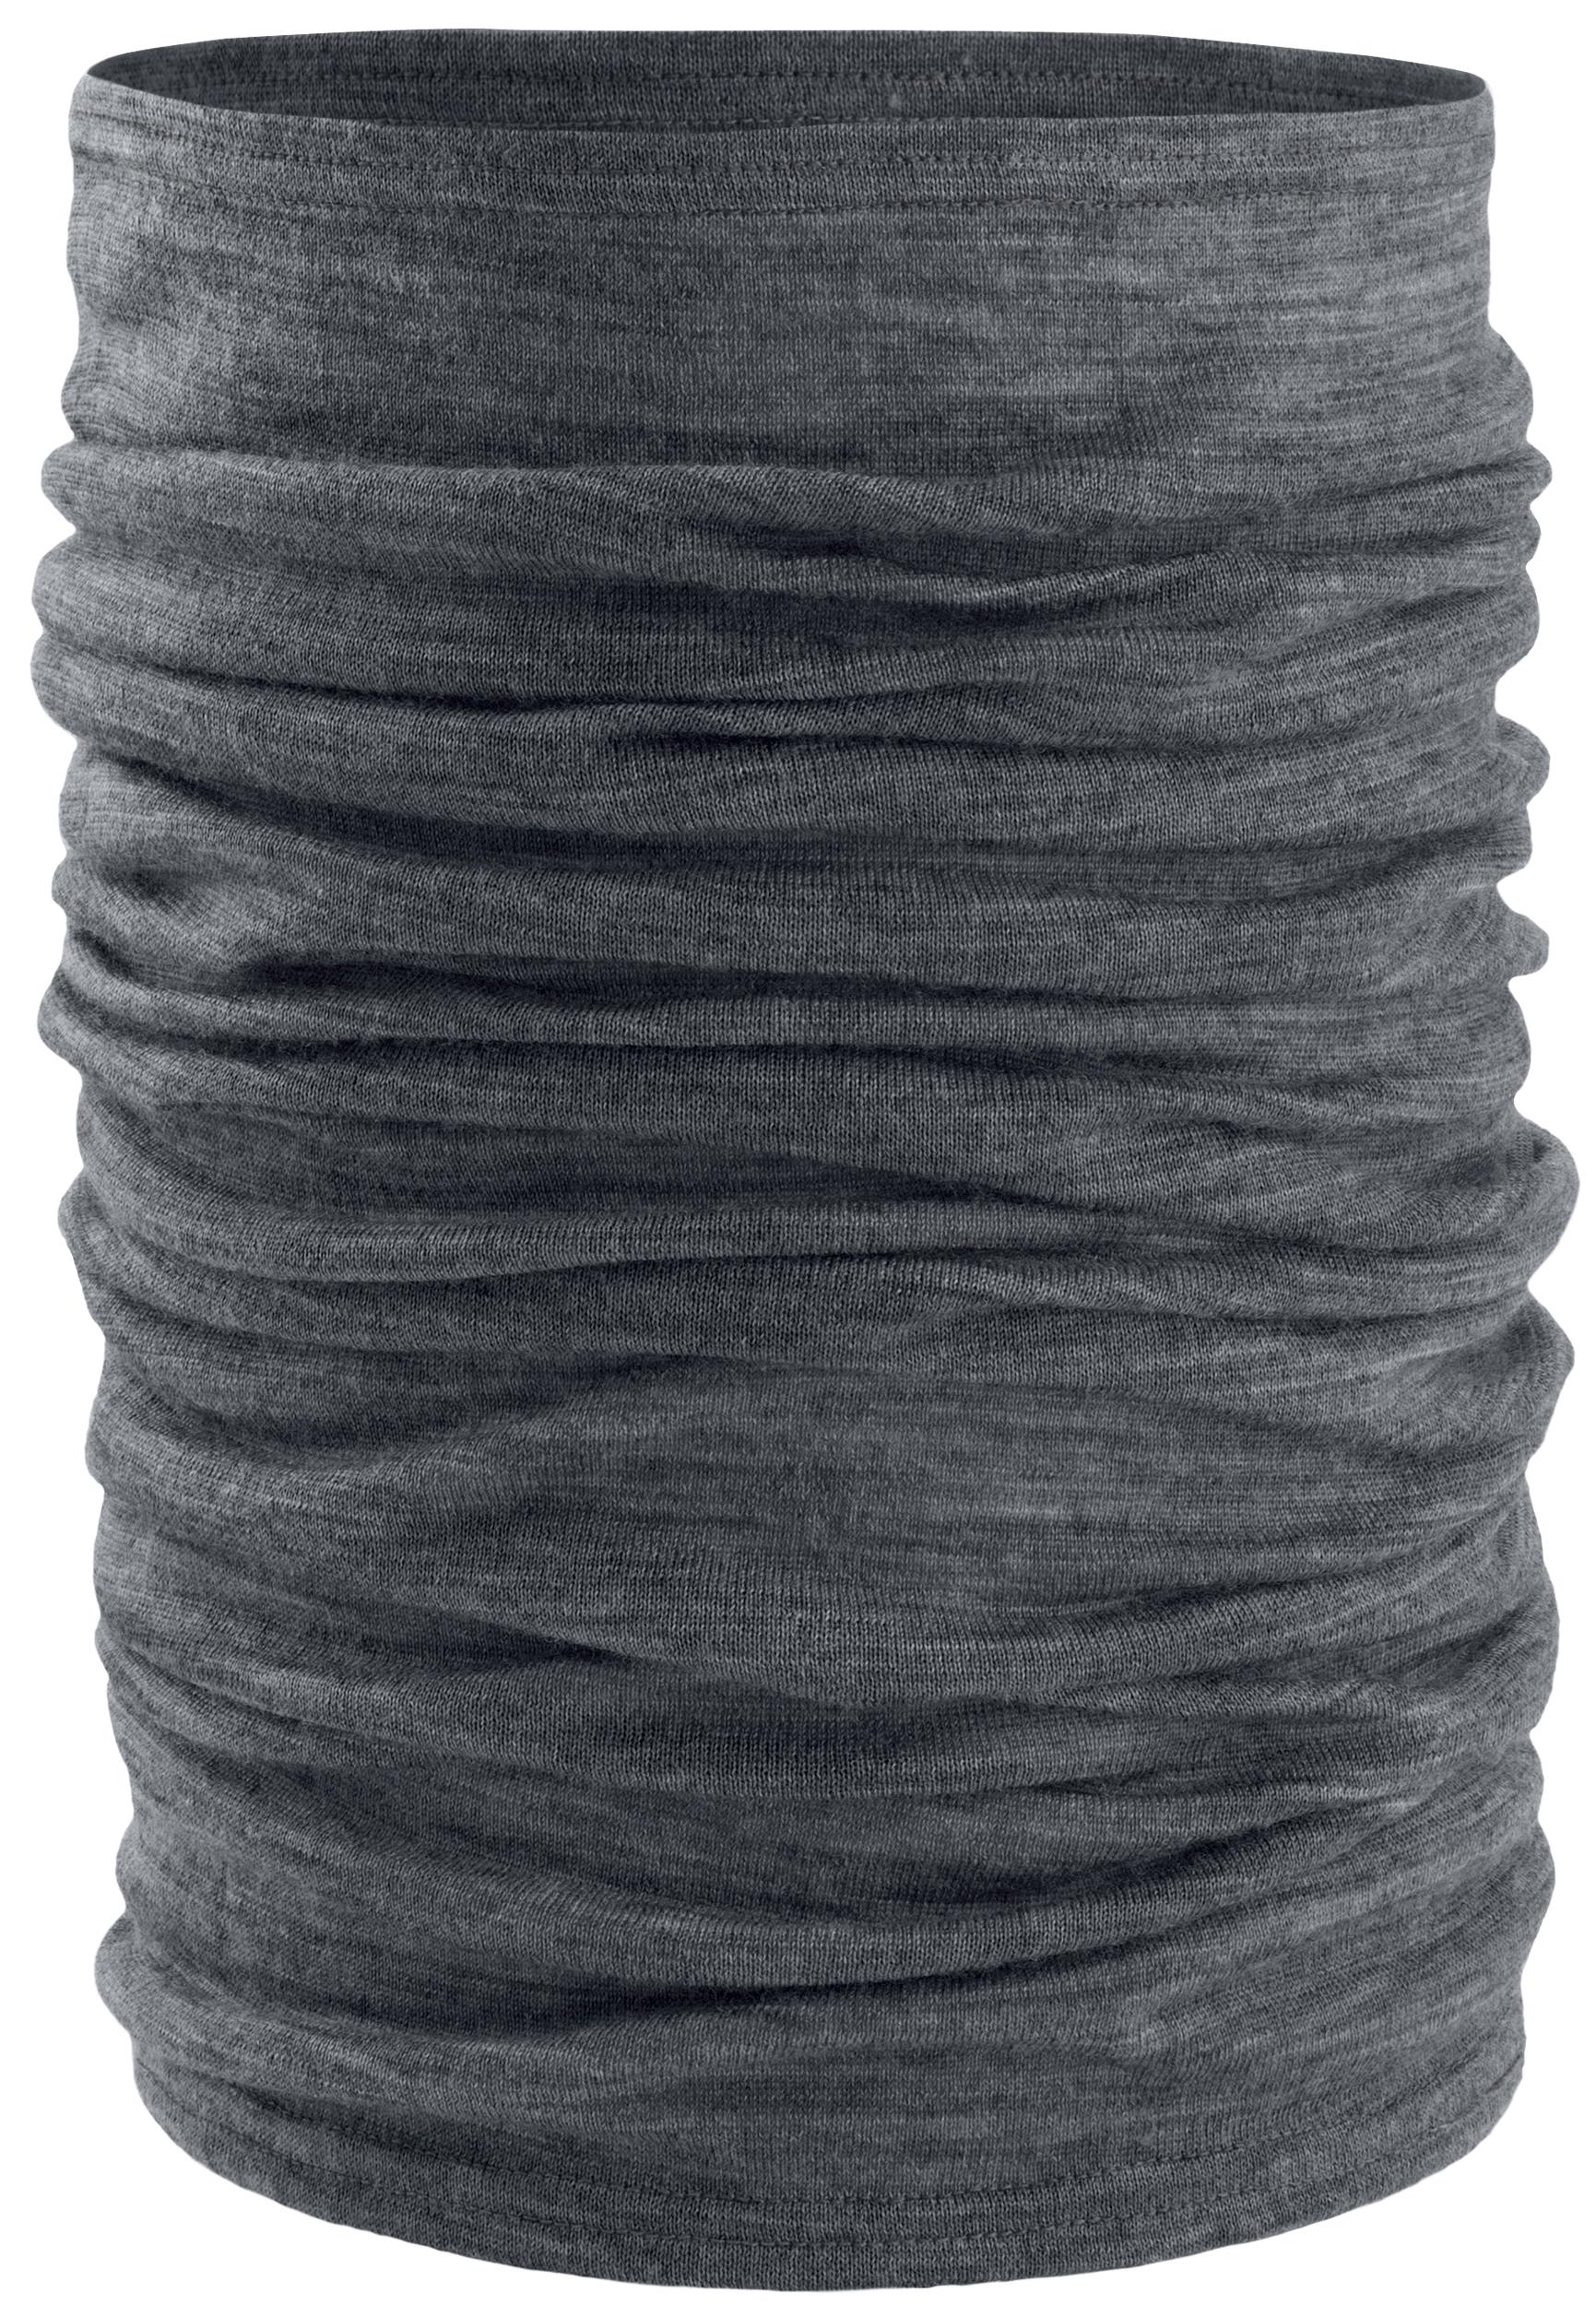 06a8c3fe151 Chaos Merino Wool Tubular Headwear - Unisex